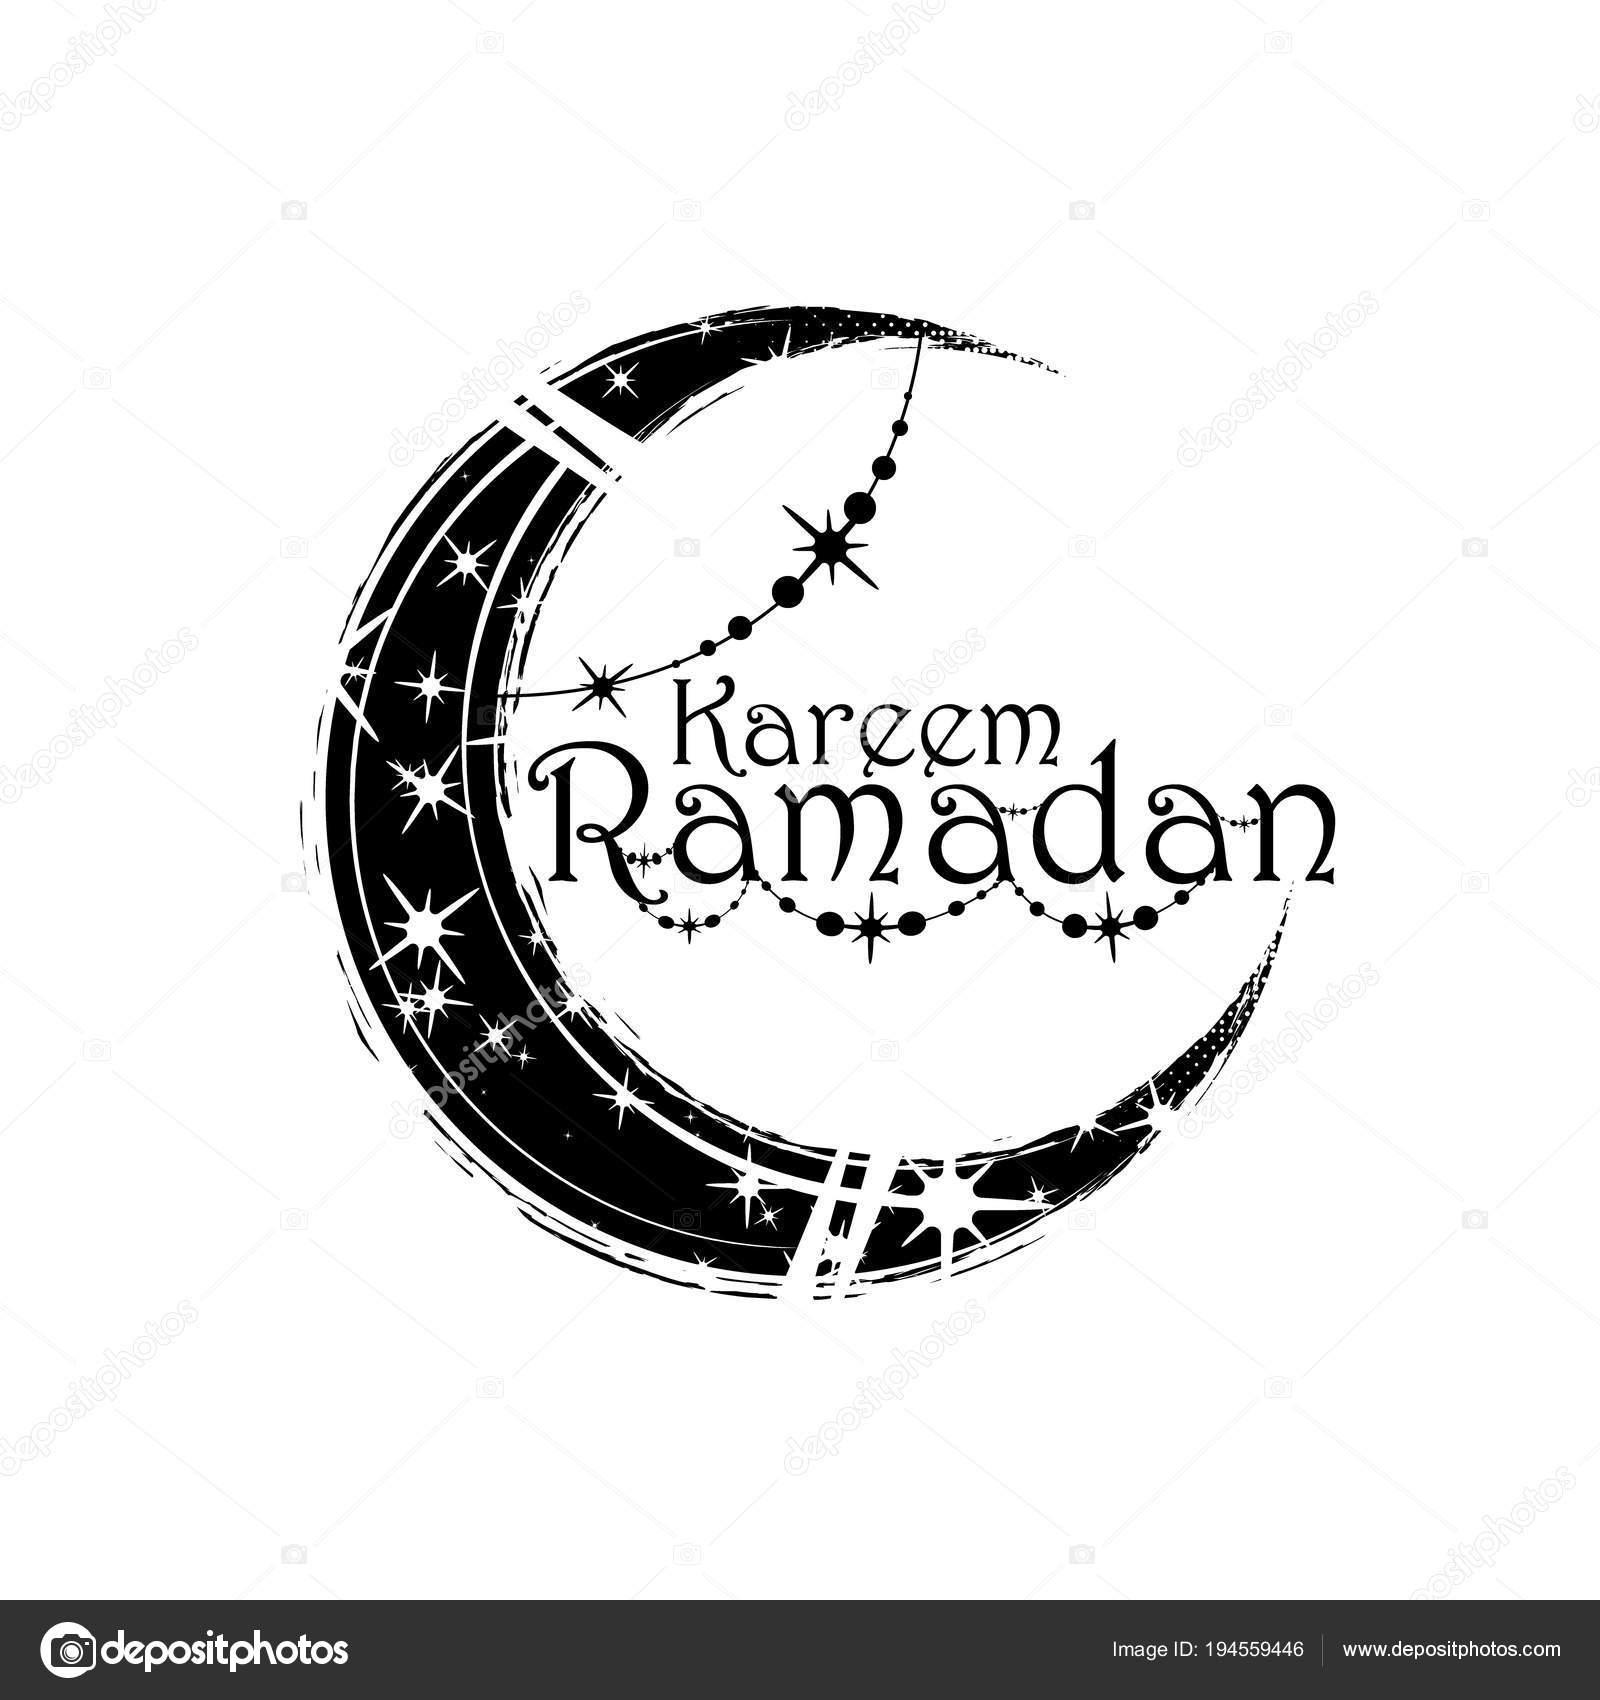 Ramadan kareem islamic greeting arabic calligraphy and moon with a ramadan kareem islamic greeting arabic calligraphy and moon with a pattern and decoration stock vector m4hsunfo